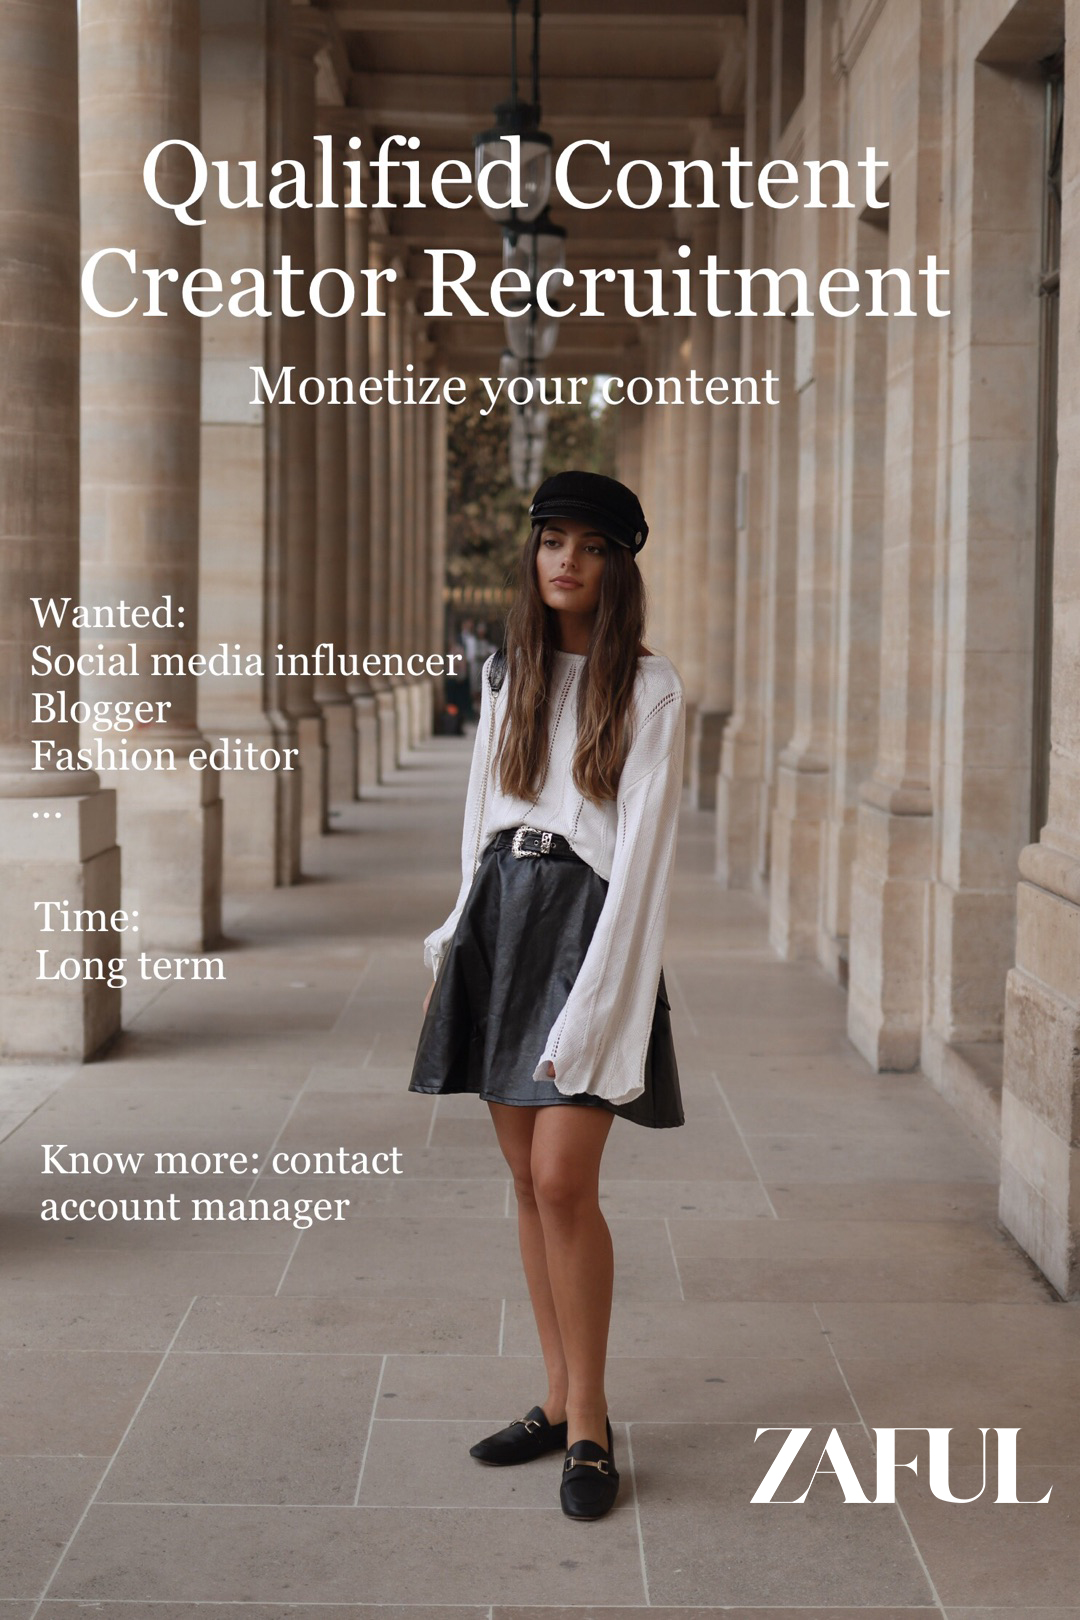 ZAFUL | Content Creator Recruitment | Monetize your content